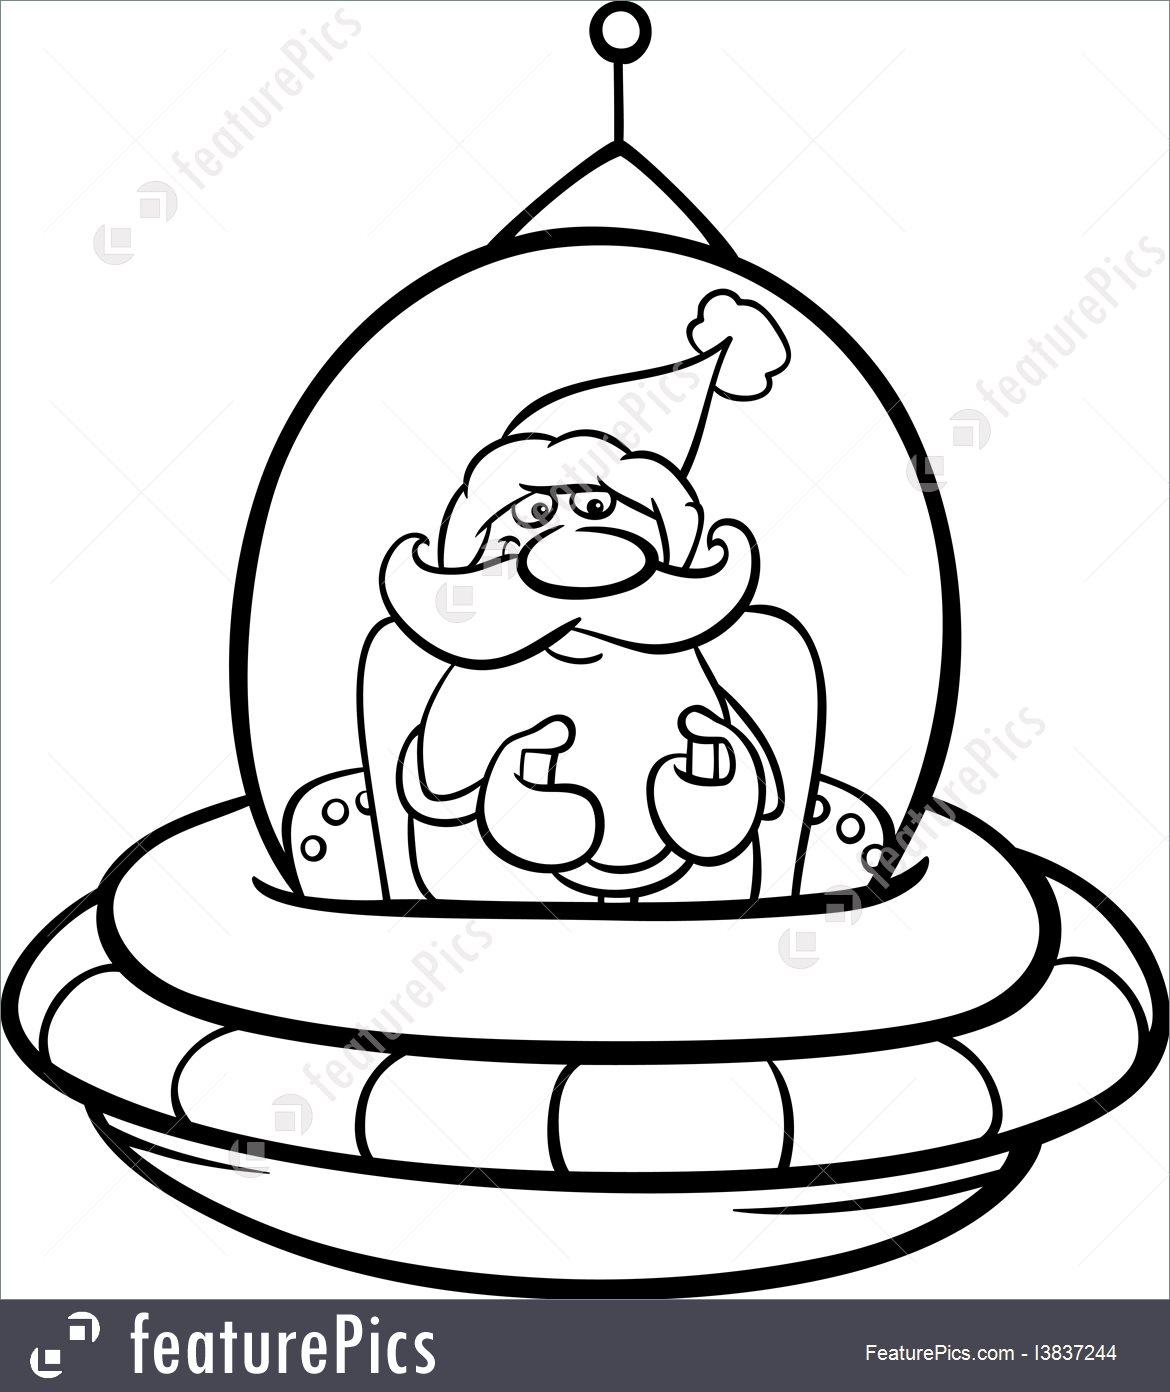 1170x1392 Holidays Santa In Spaceship Coloring Page